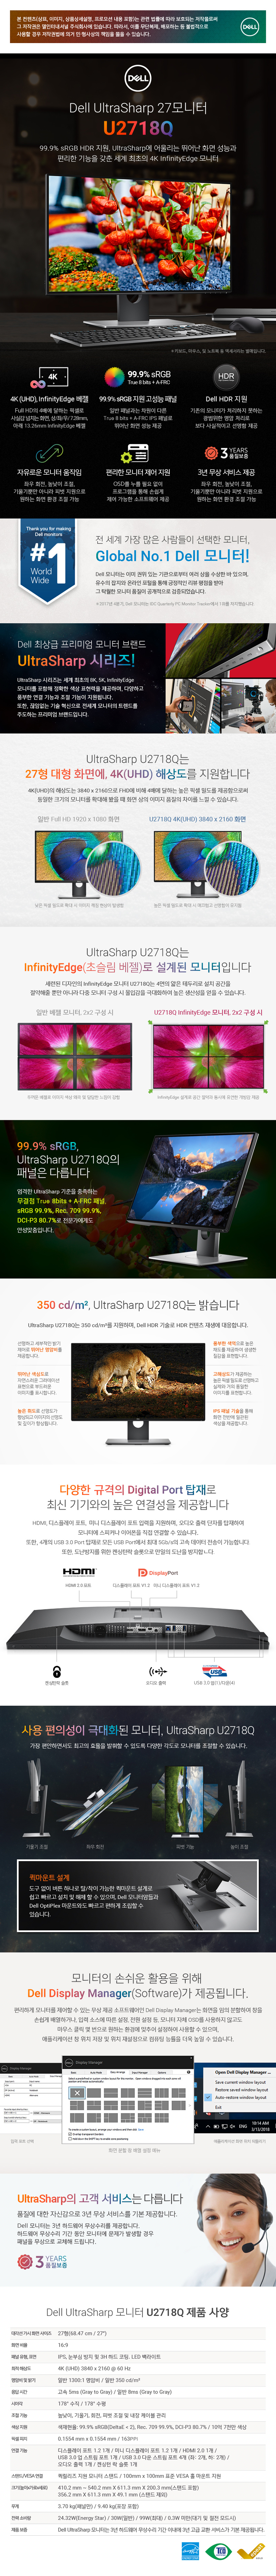 Dell 4K UHD HDR High Resolution U2718Q Dell 27inch Monitors